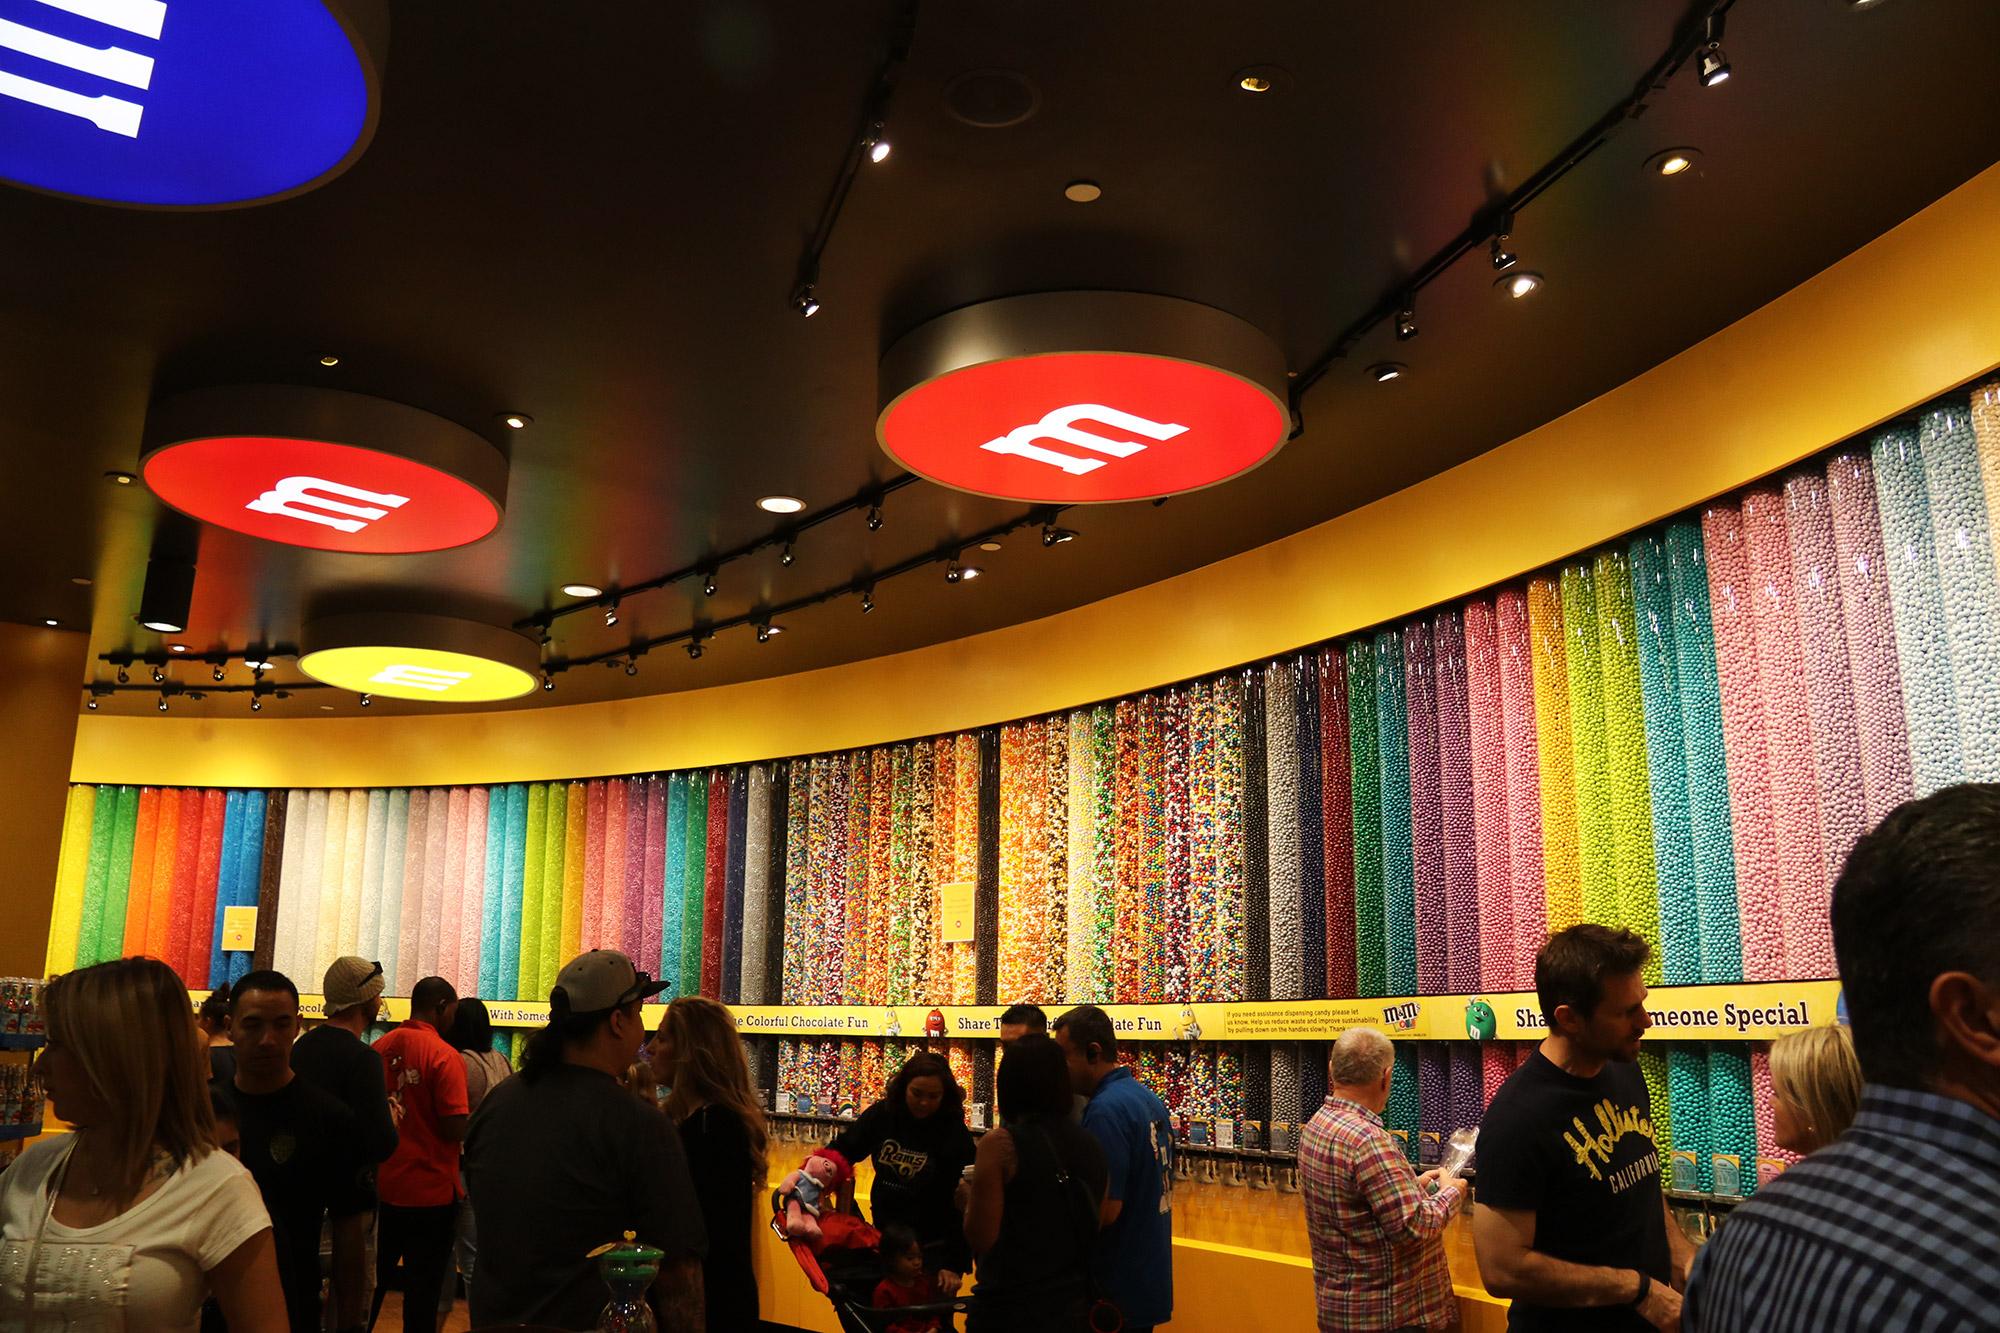 Amerika dag 17 - Las Vegas - M&M's Store